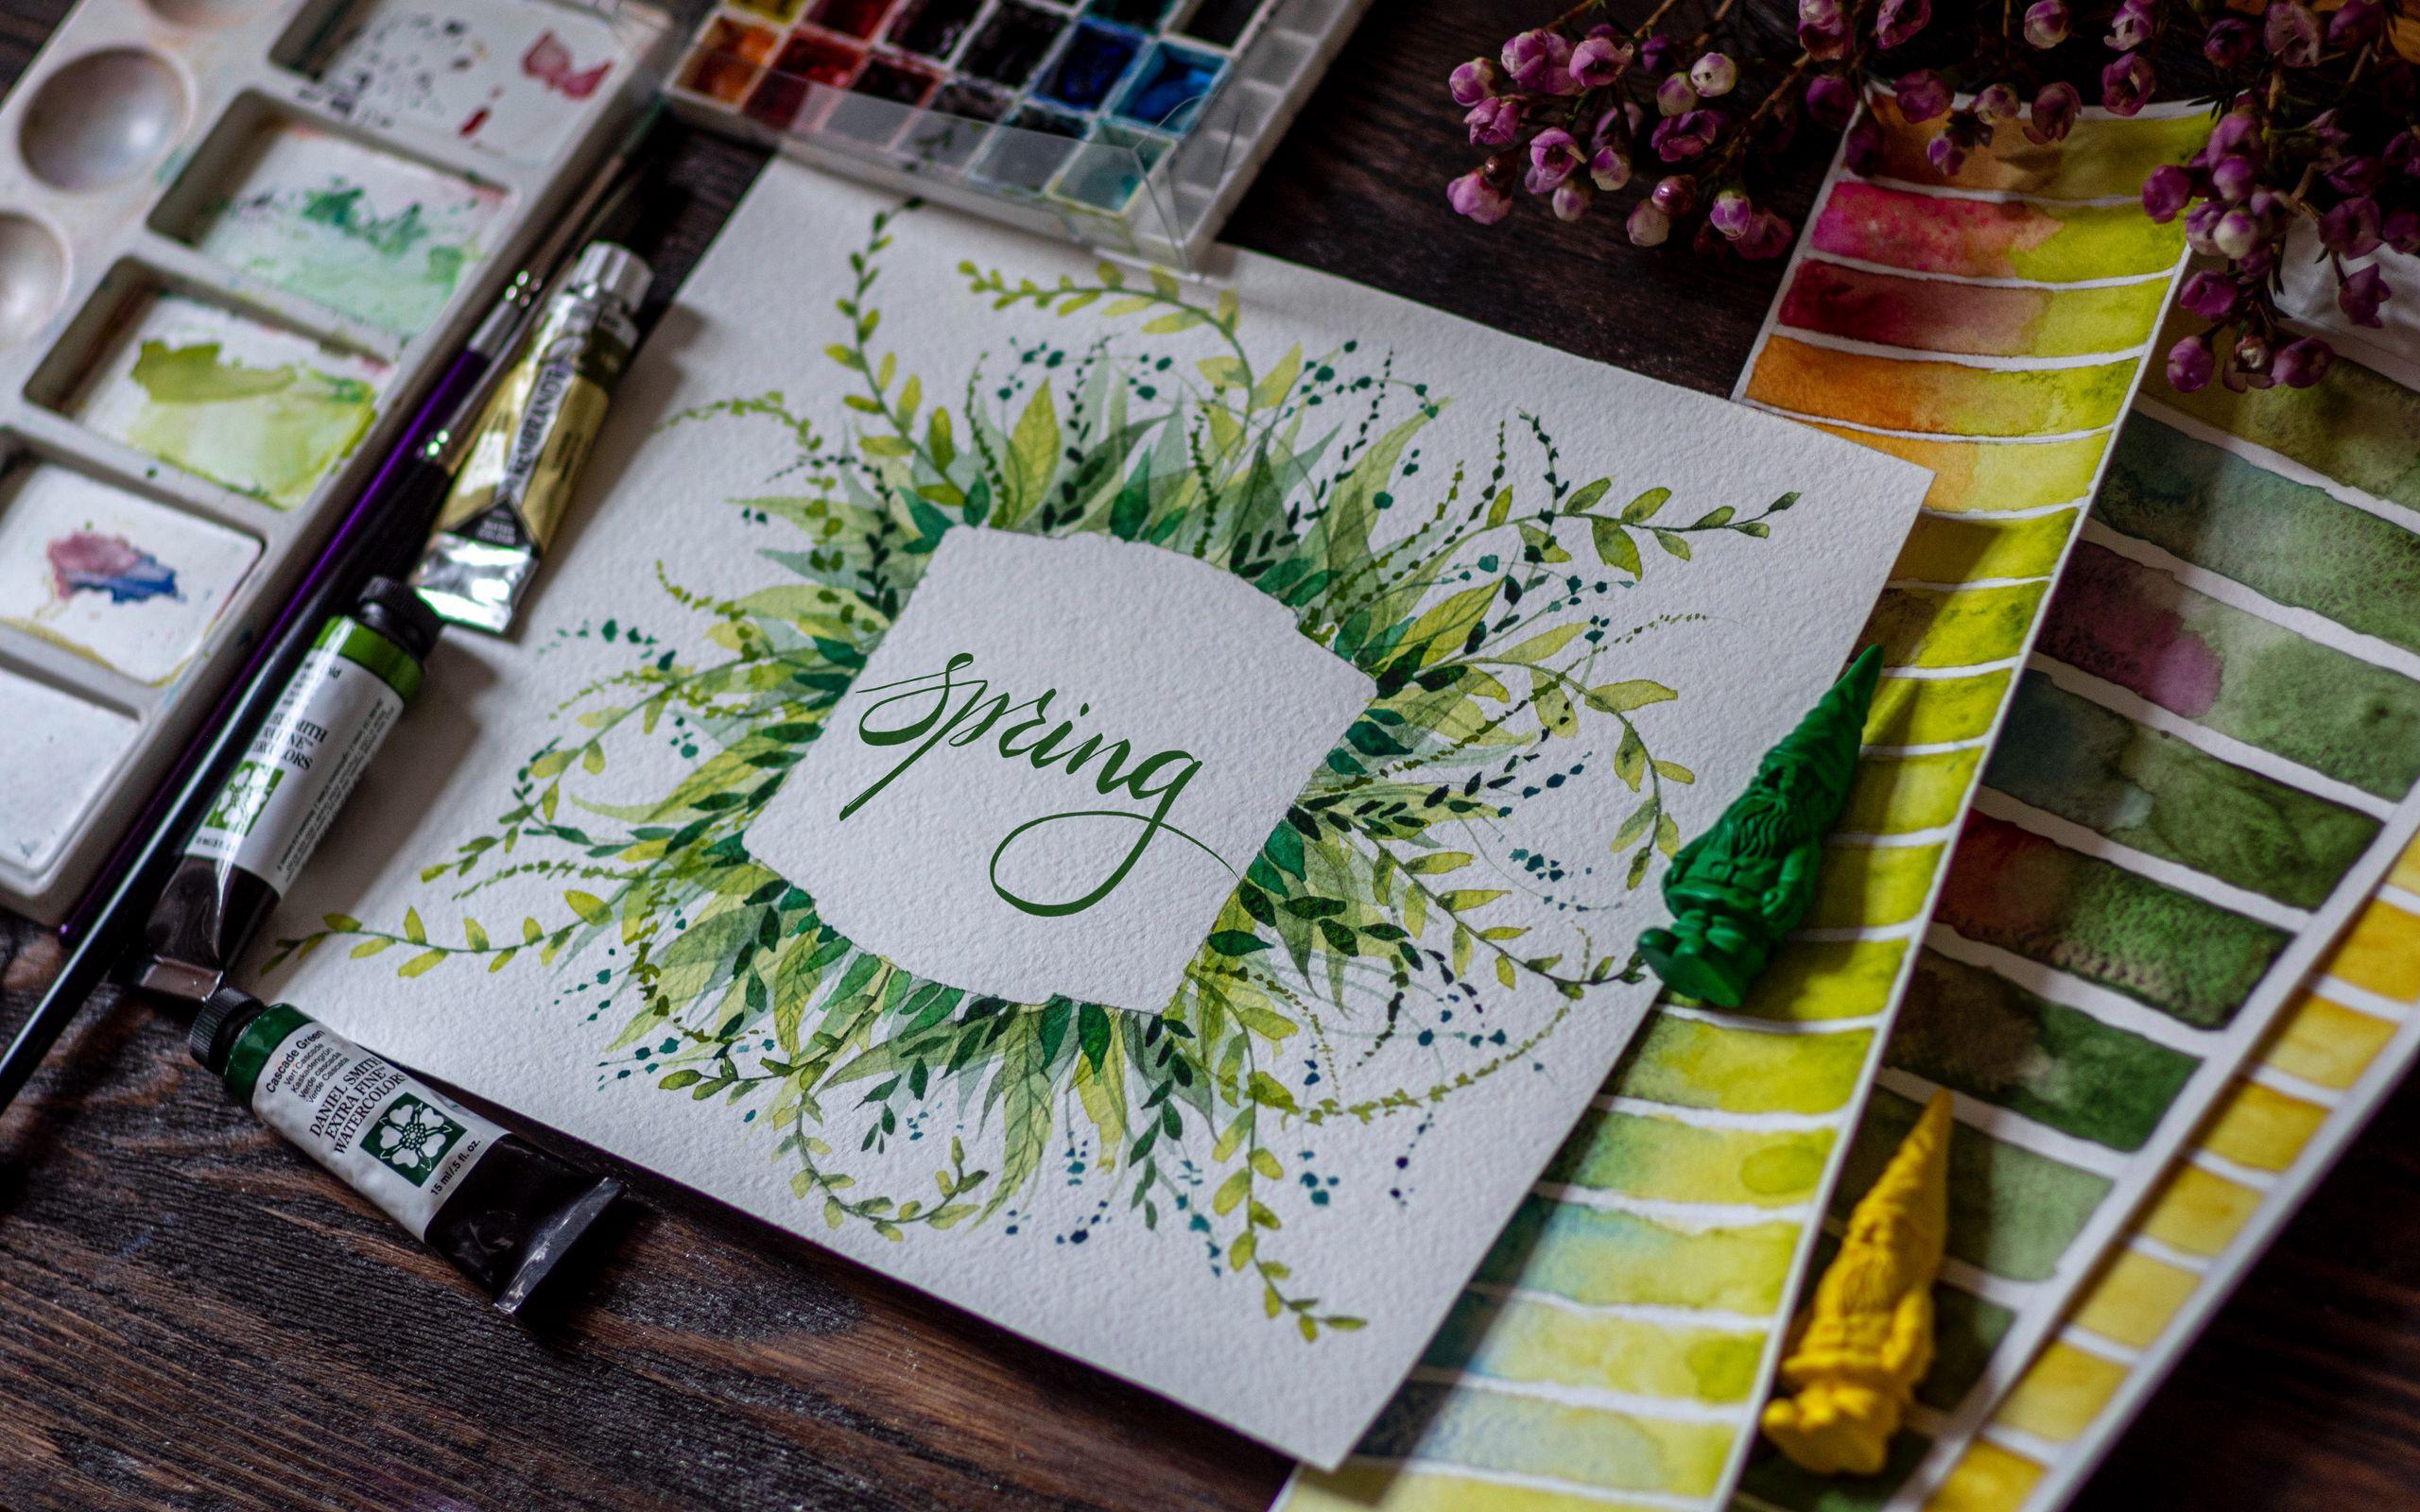 2560x1600 Обои весна, слово, леттеринг, краски, акварель